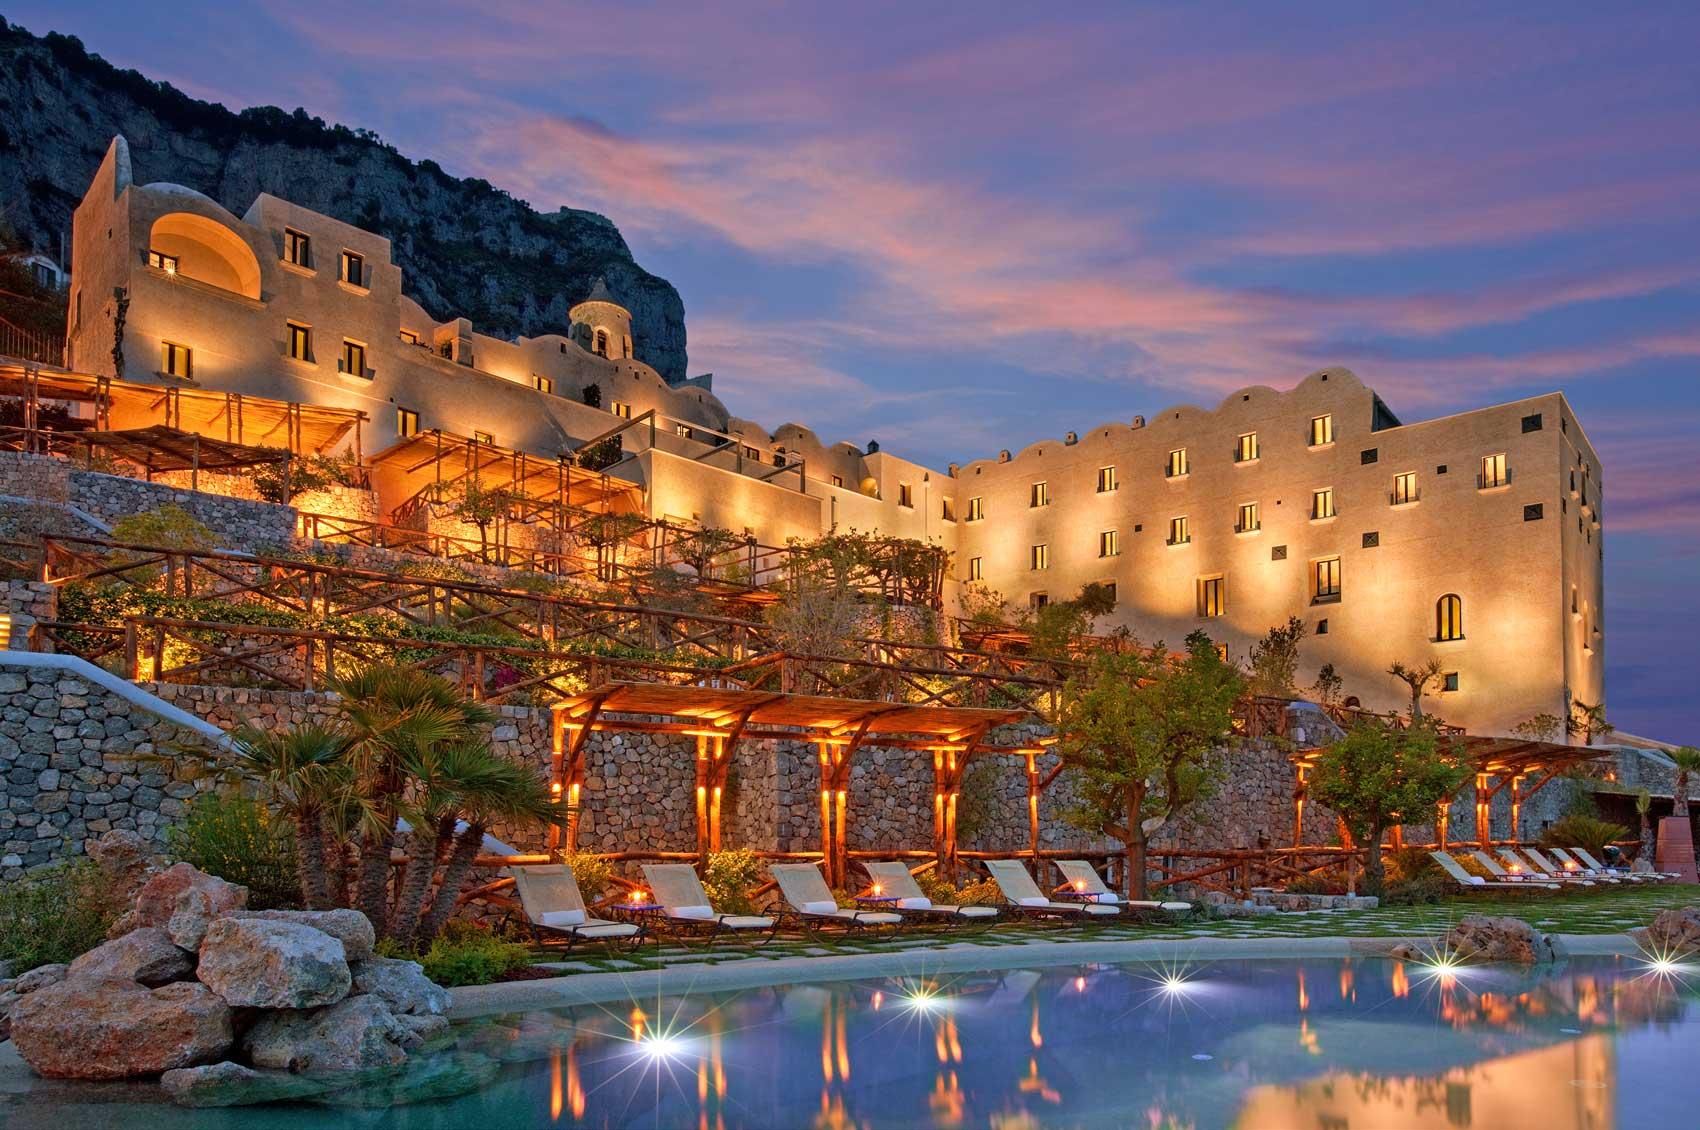 Monastero Santa Rosa Hotel & Spa Fodor\'s 100 Hotel Awards 2012